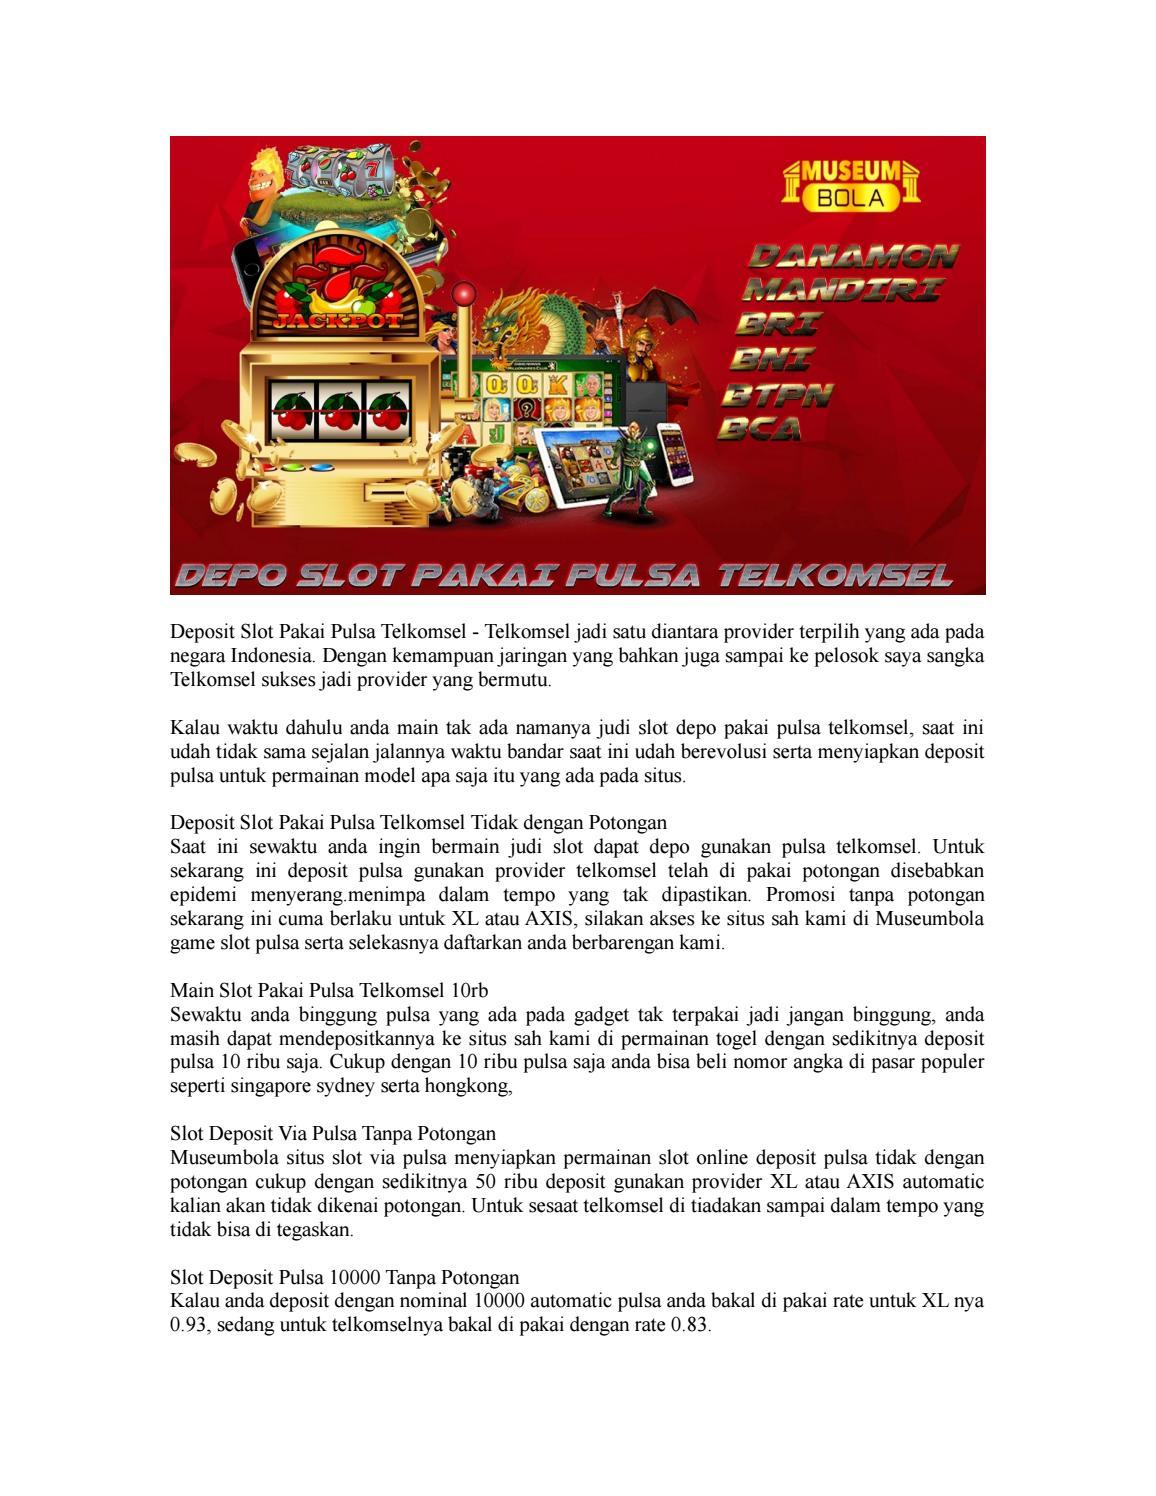 Deposit Slot Pakai Pulsa Telkomsel By Mind Yourhead Issuu